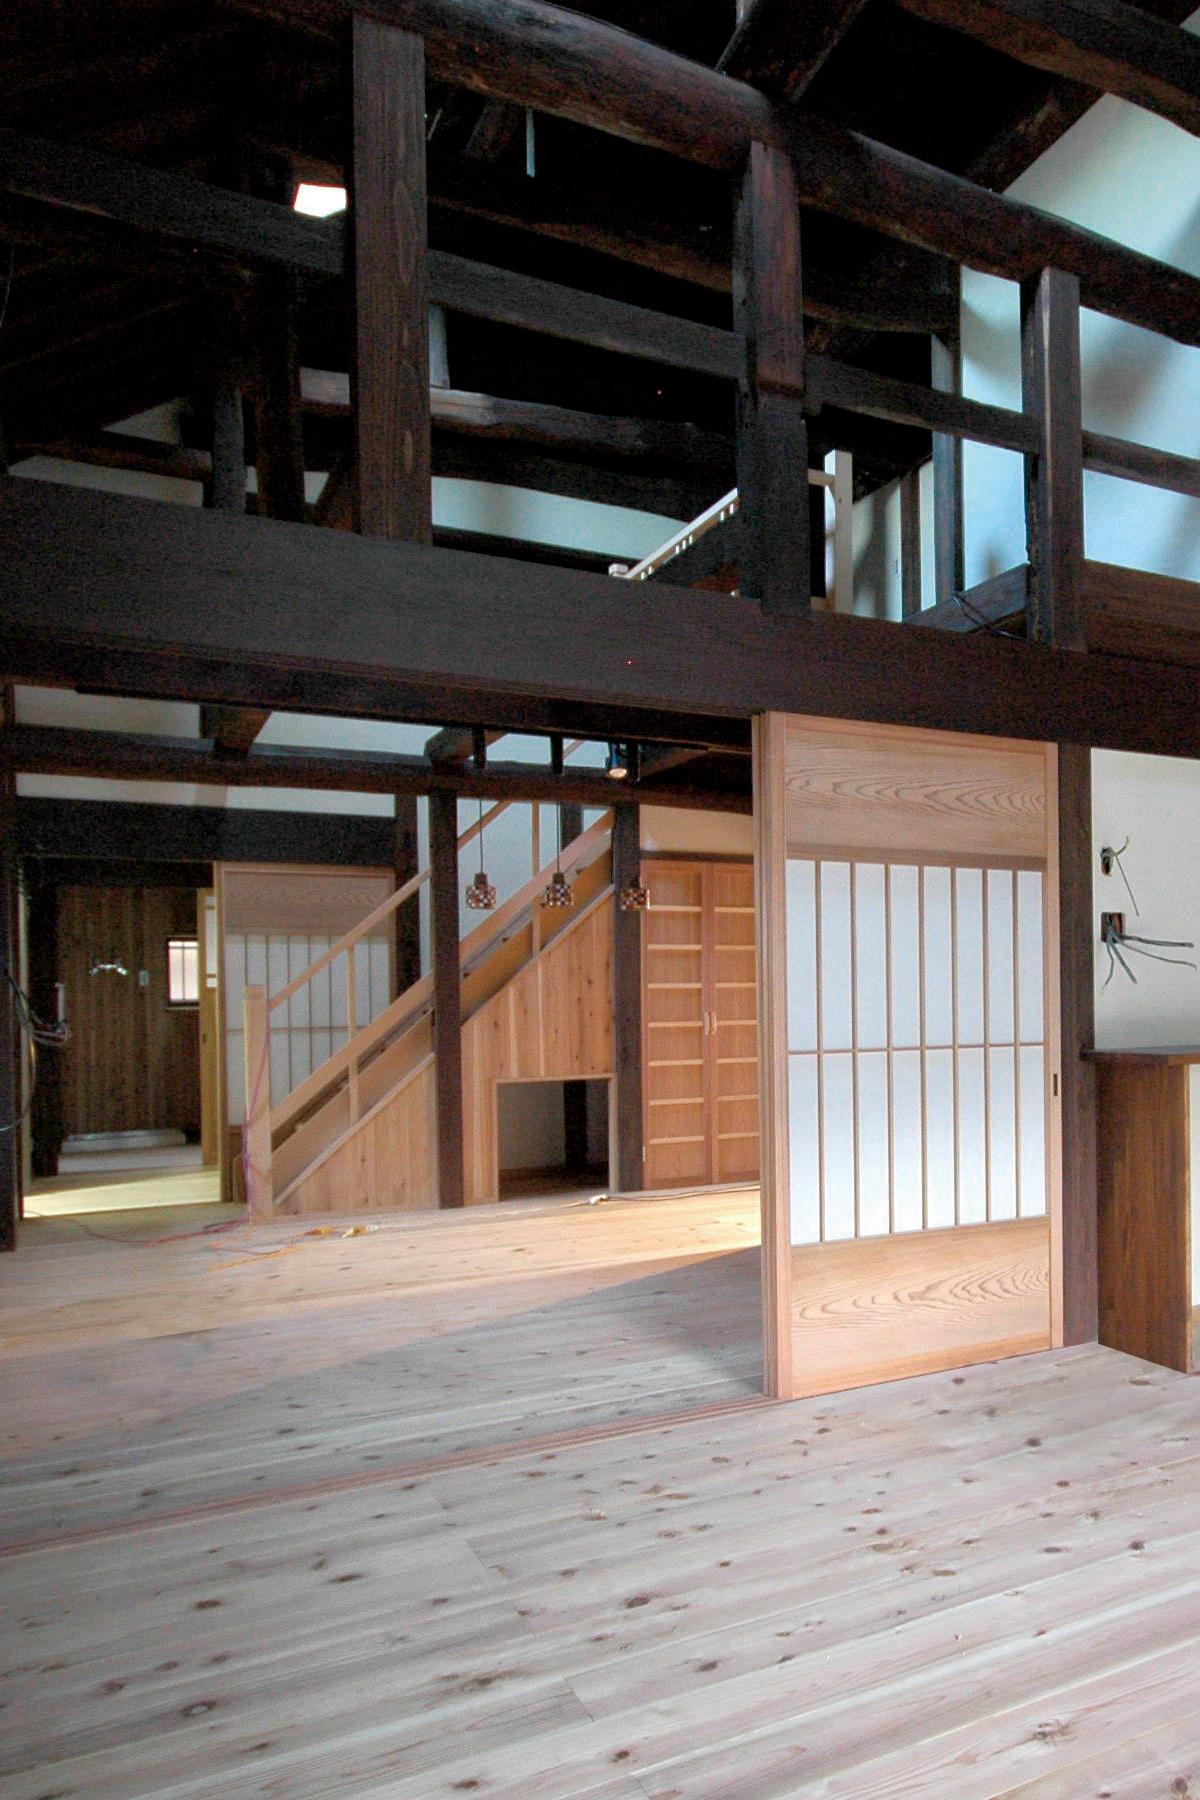 Residence_Chiba 2013